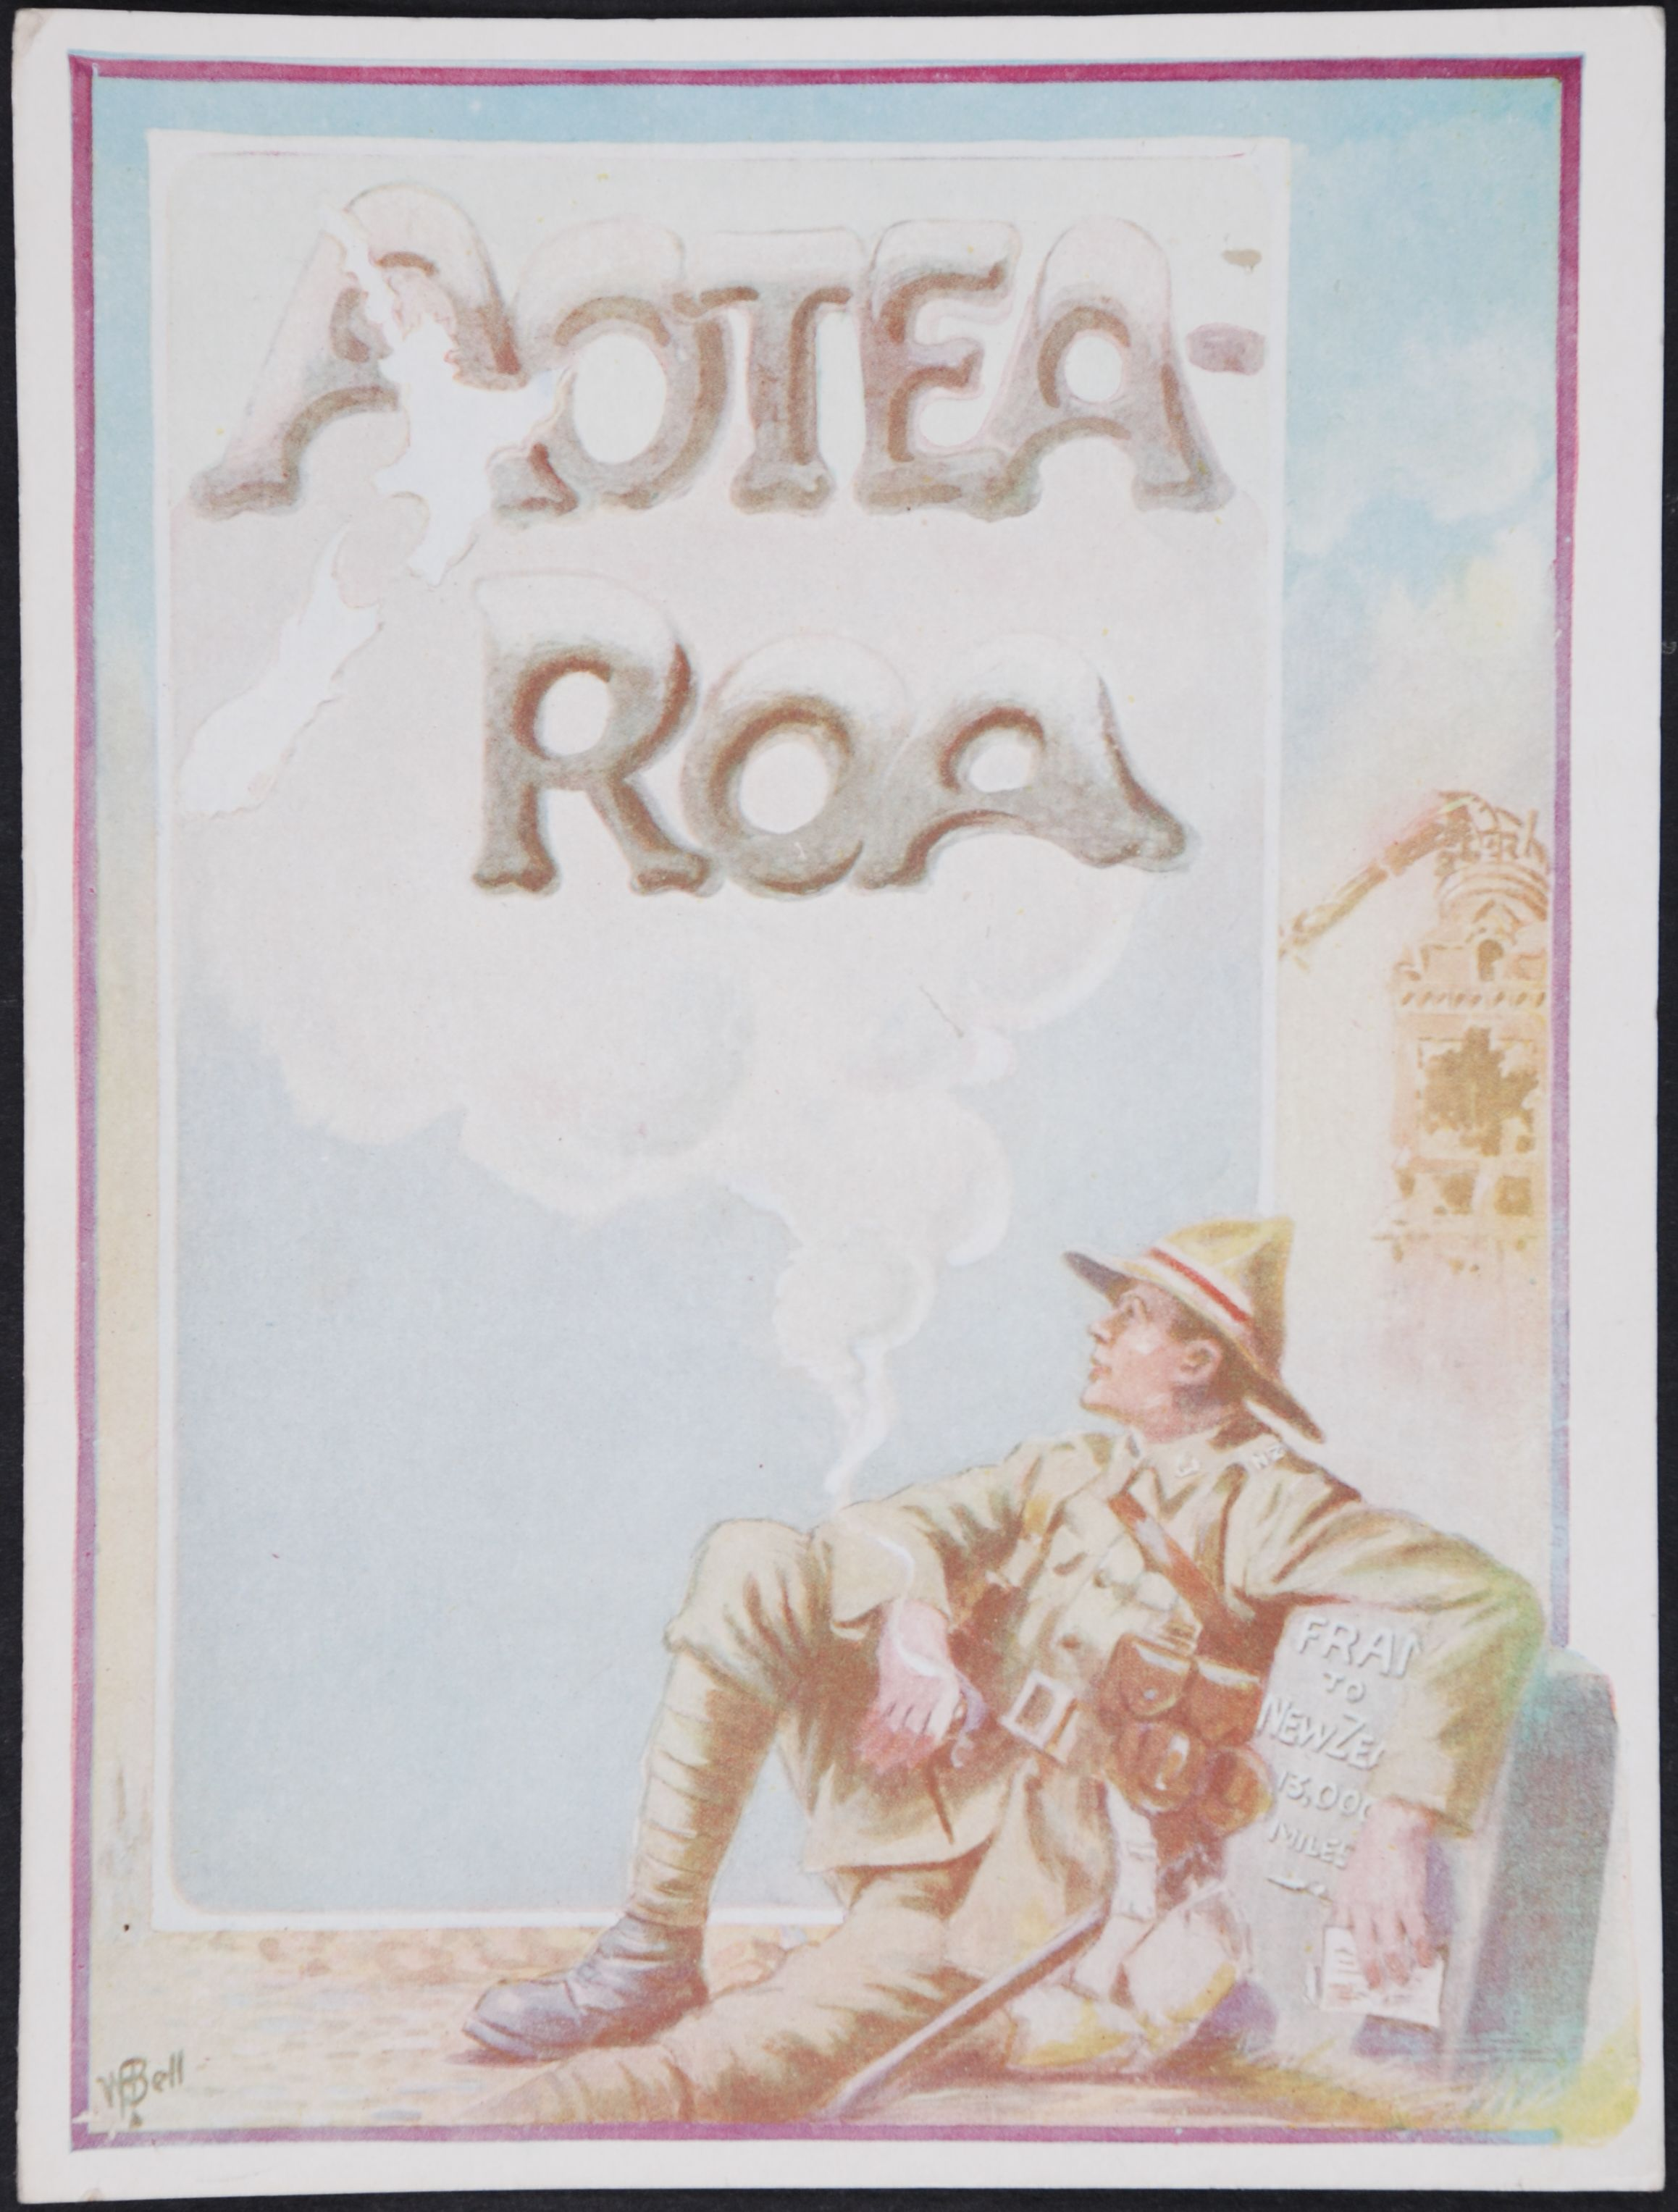 William Frederick Bell. Aotearoa. Christmas Card. 1917